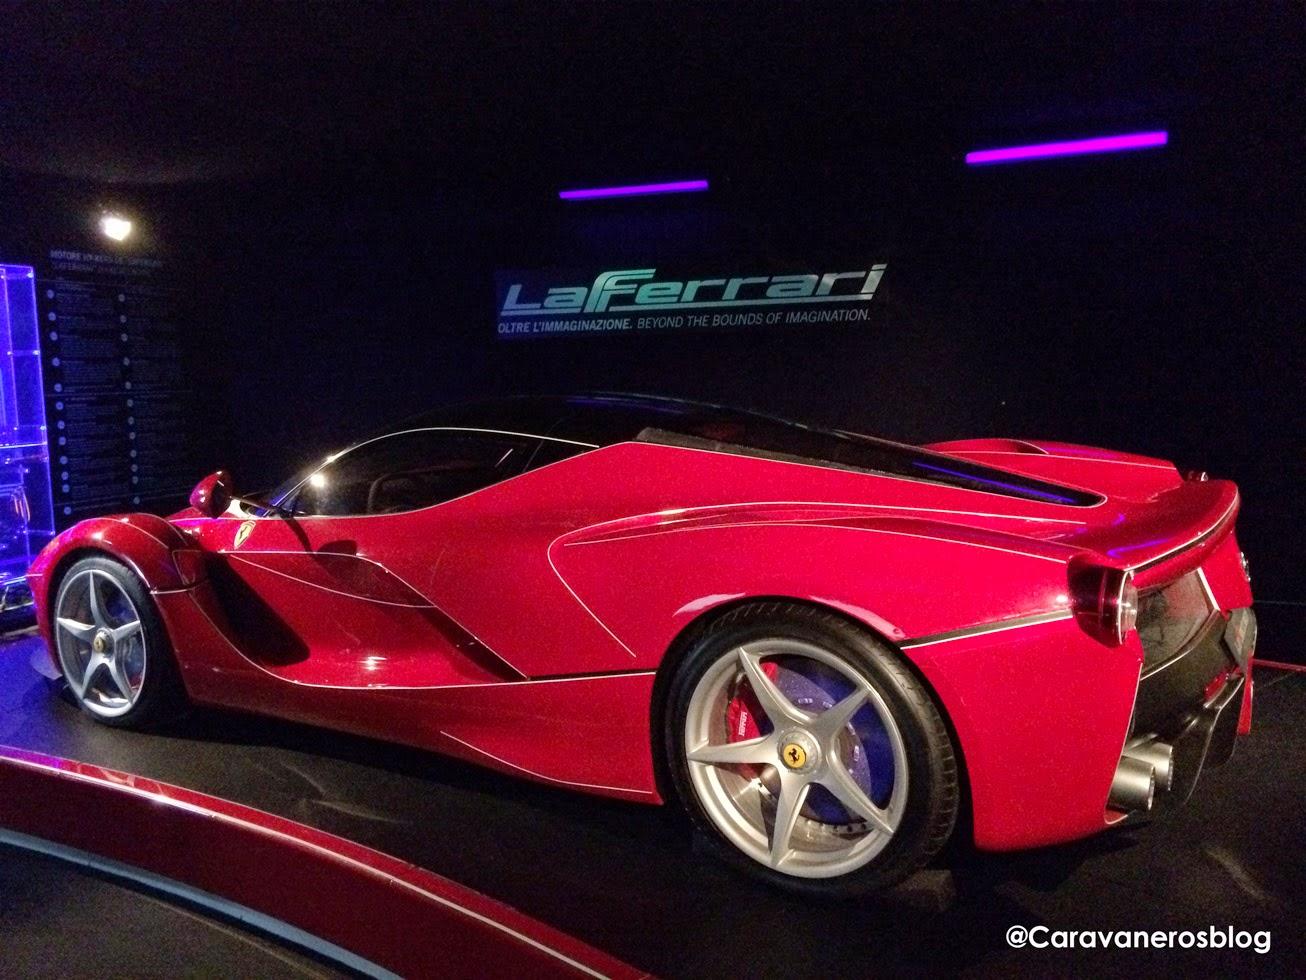 foto de La Ferrari. Galleria Ferrari. Maranello | caravaneros.com